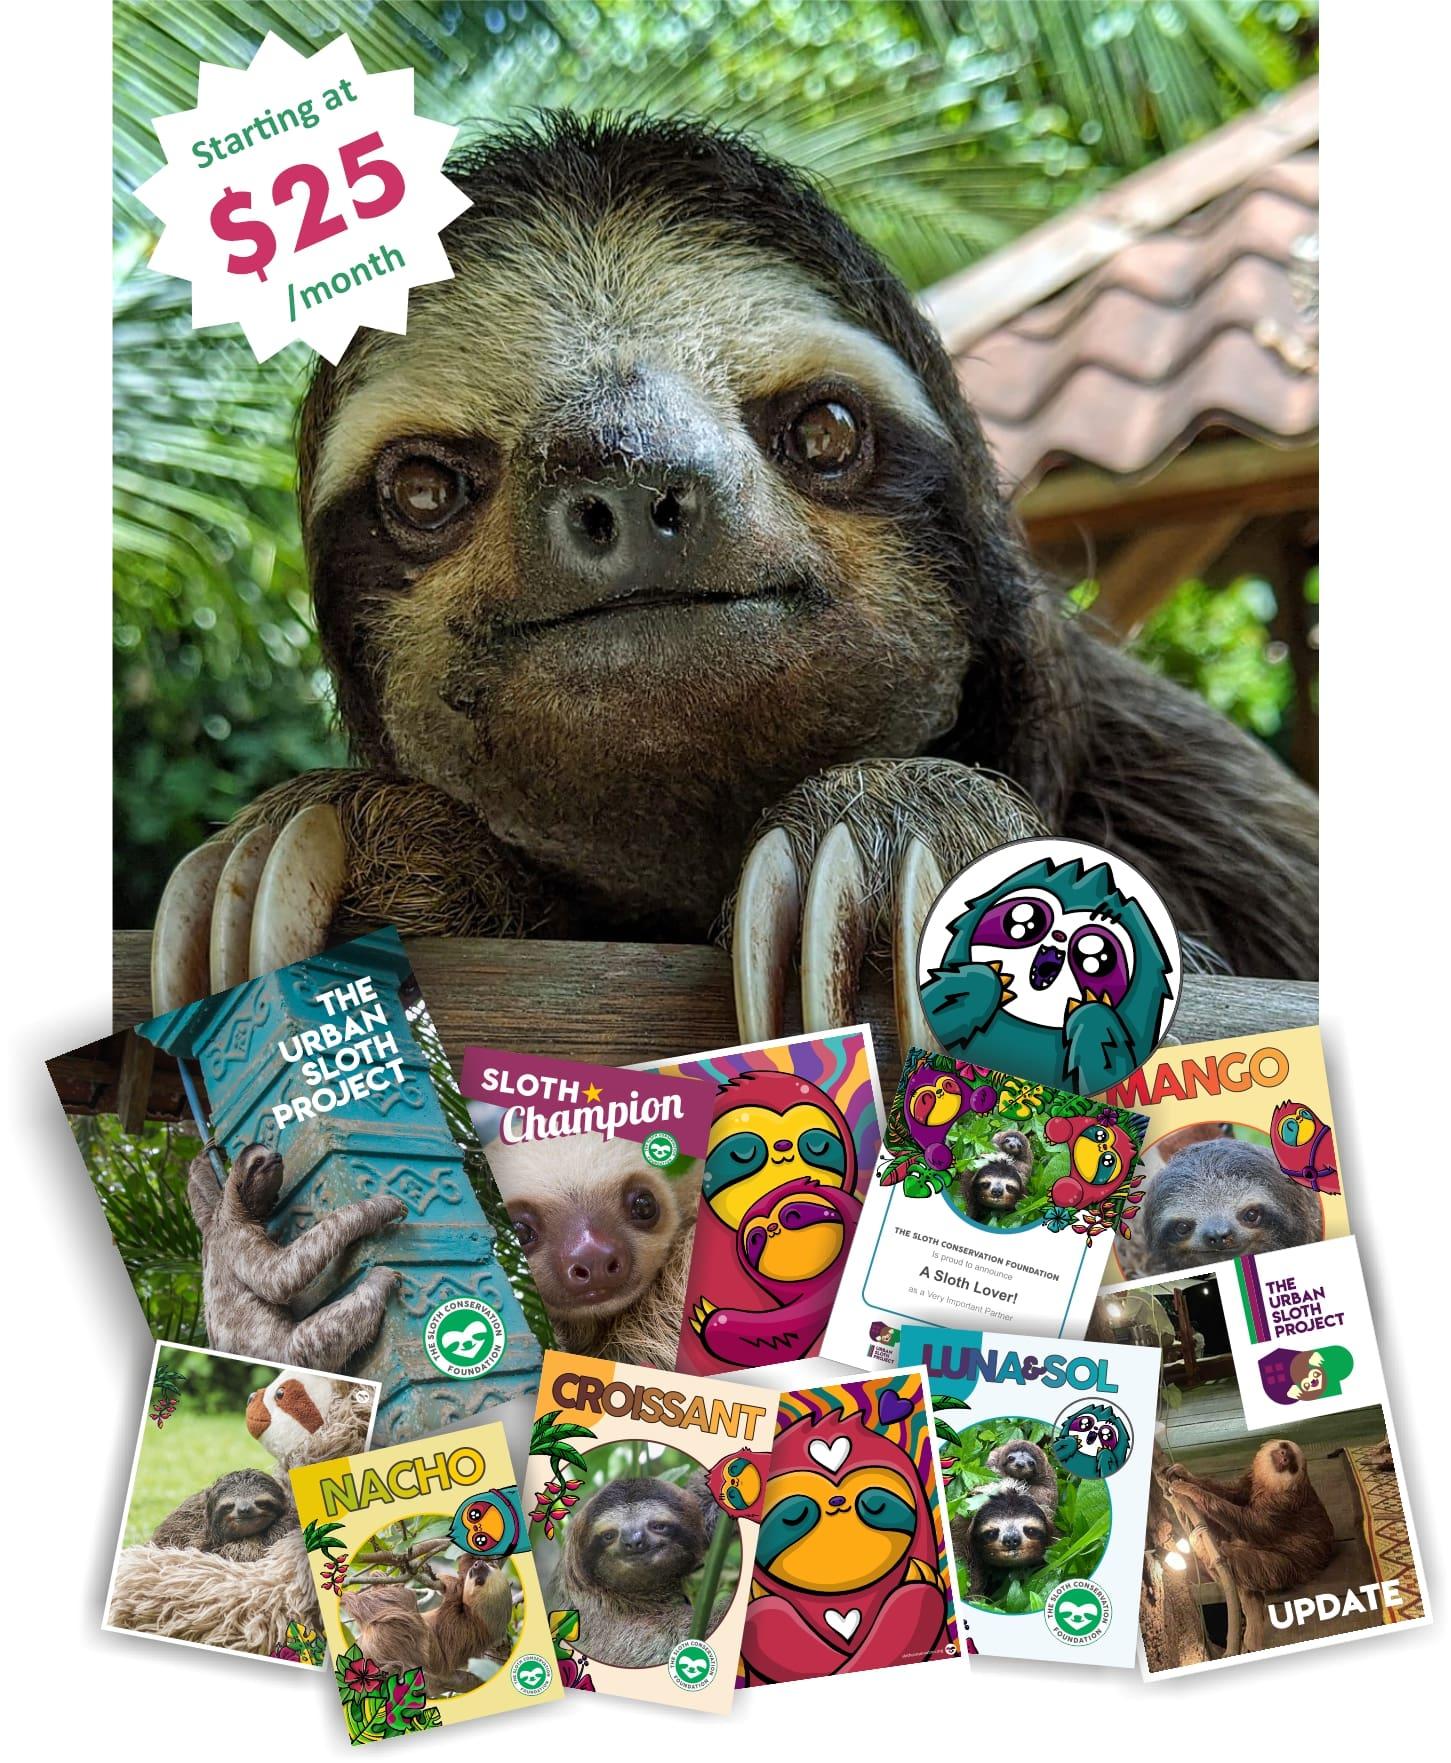 urban sloth project vip subscribe